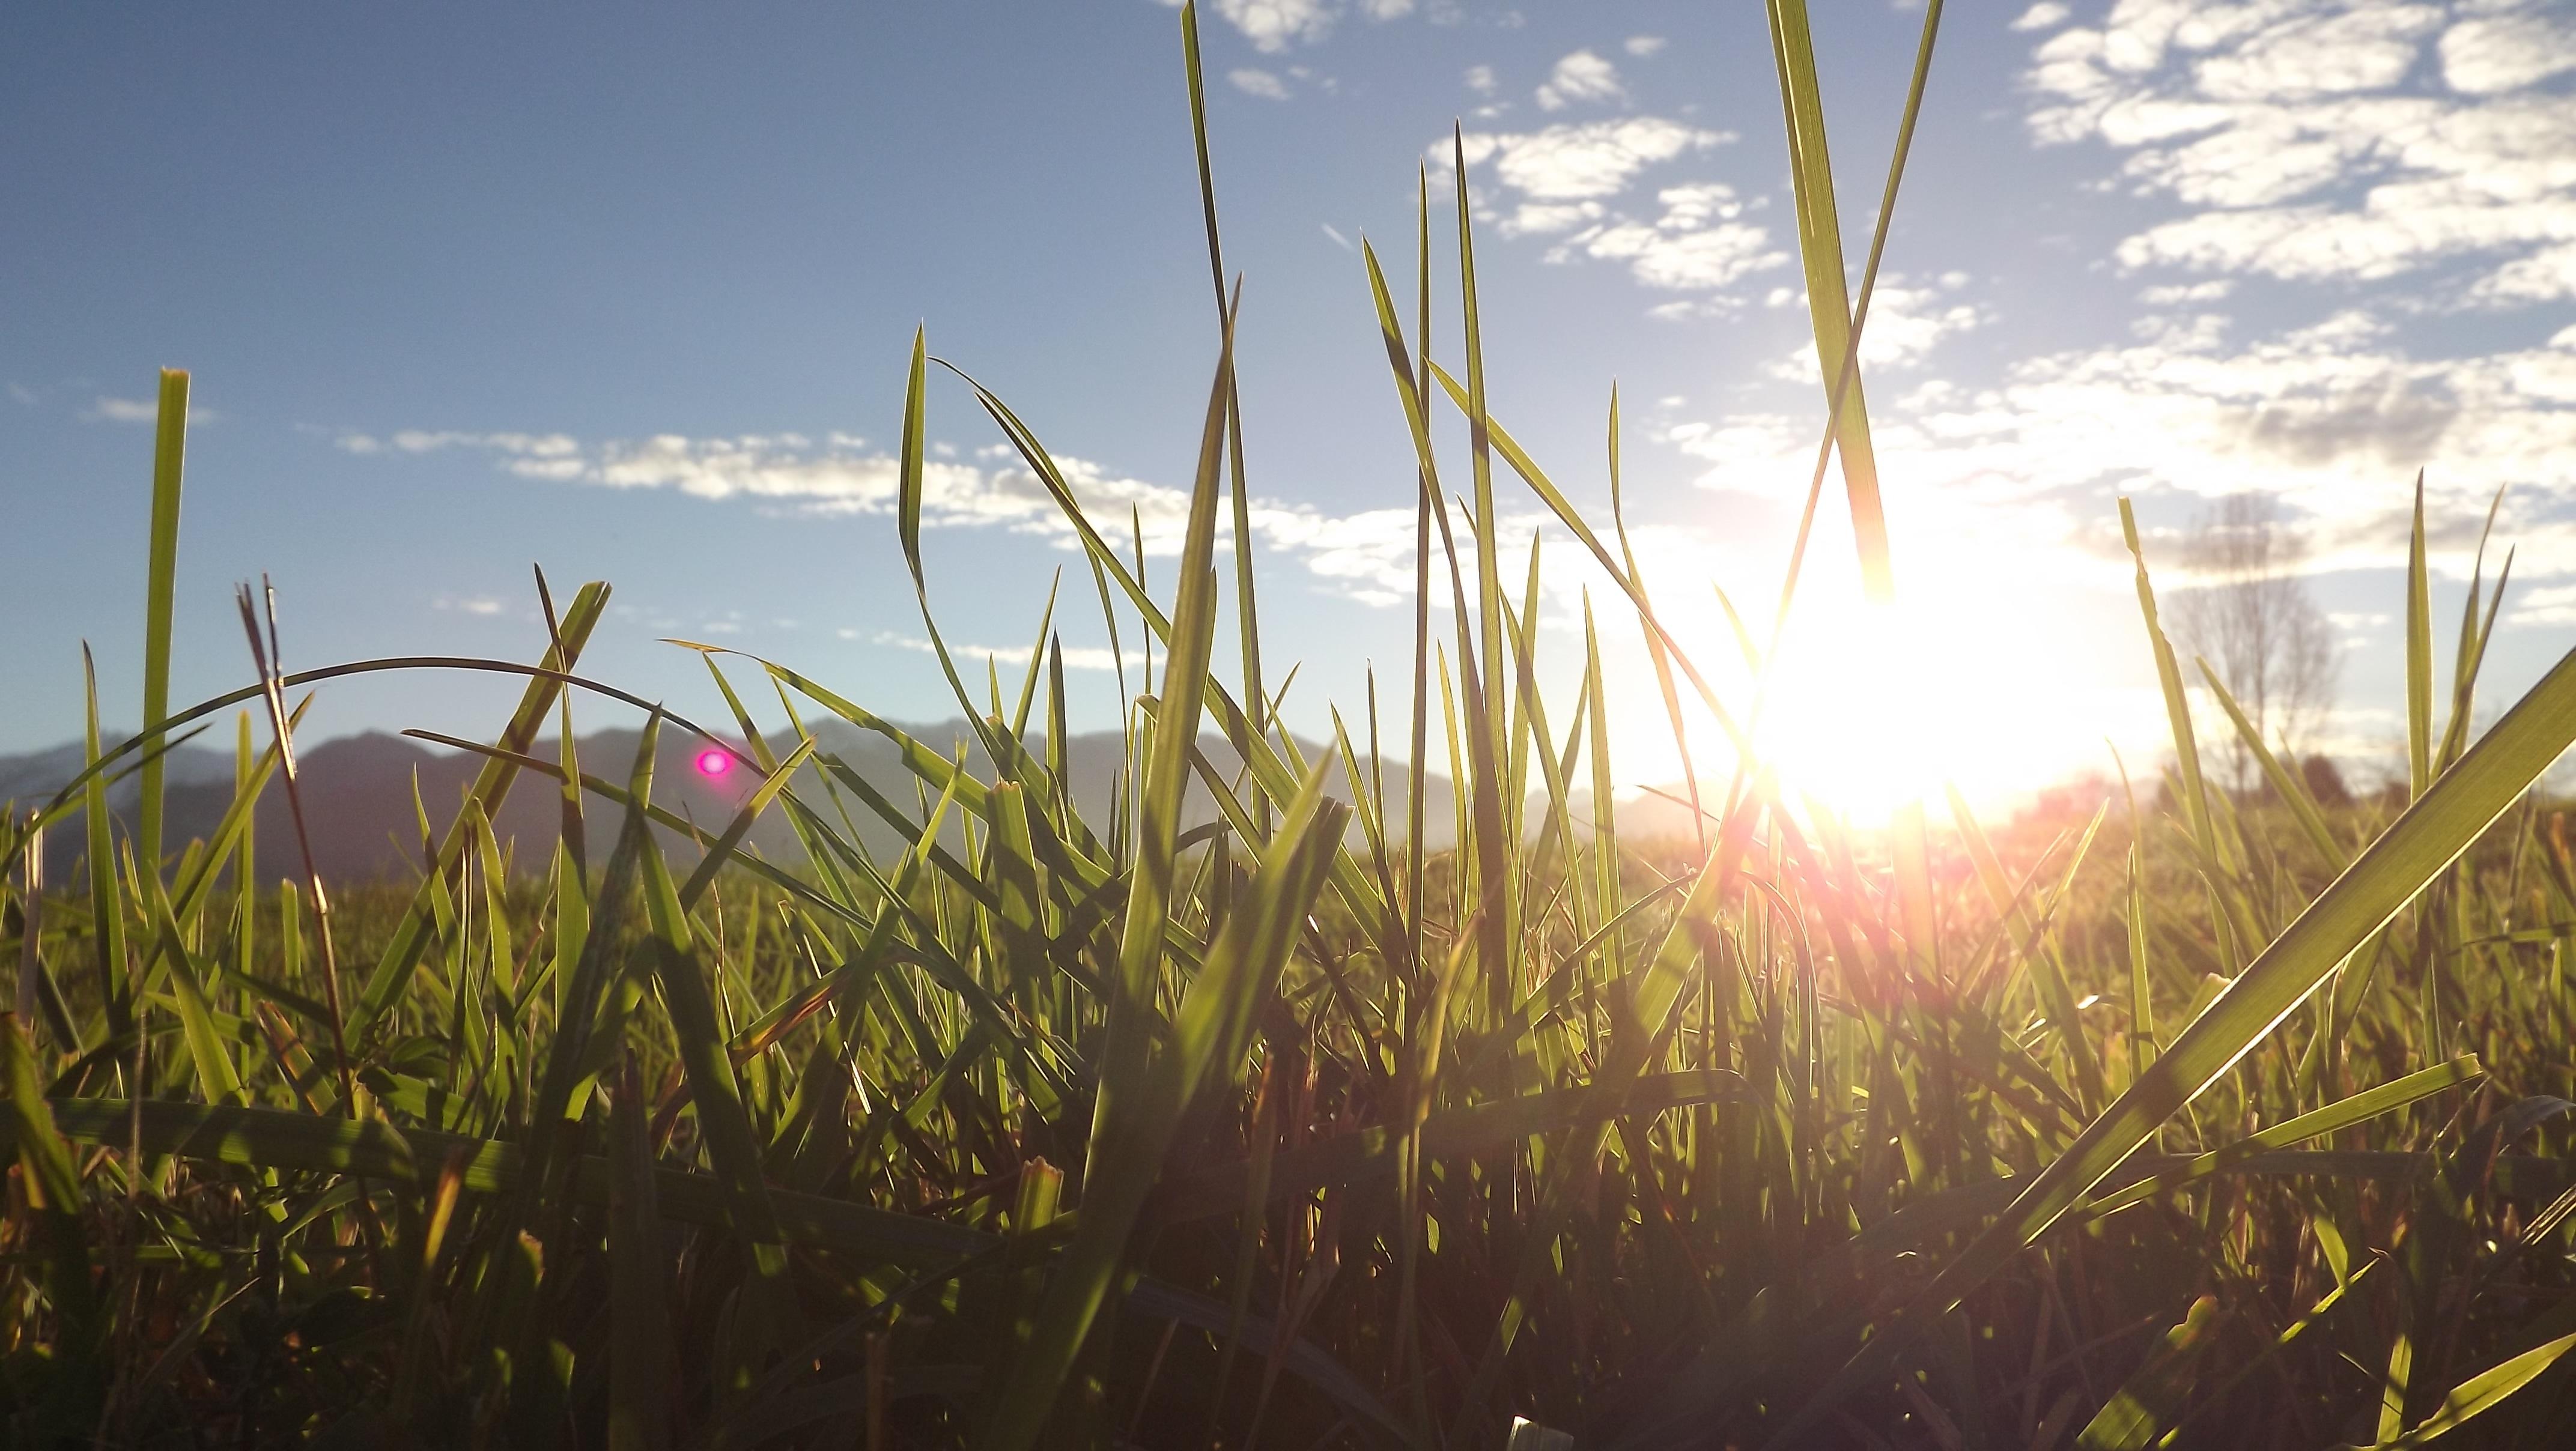 картинка утро трава природа сквере напротив